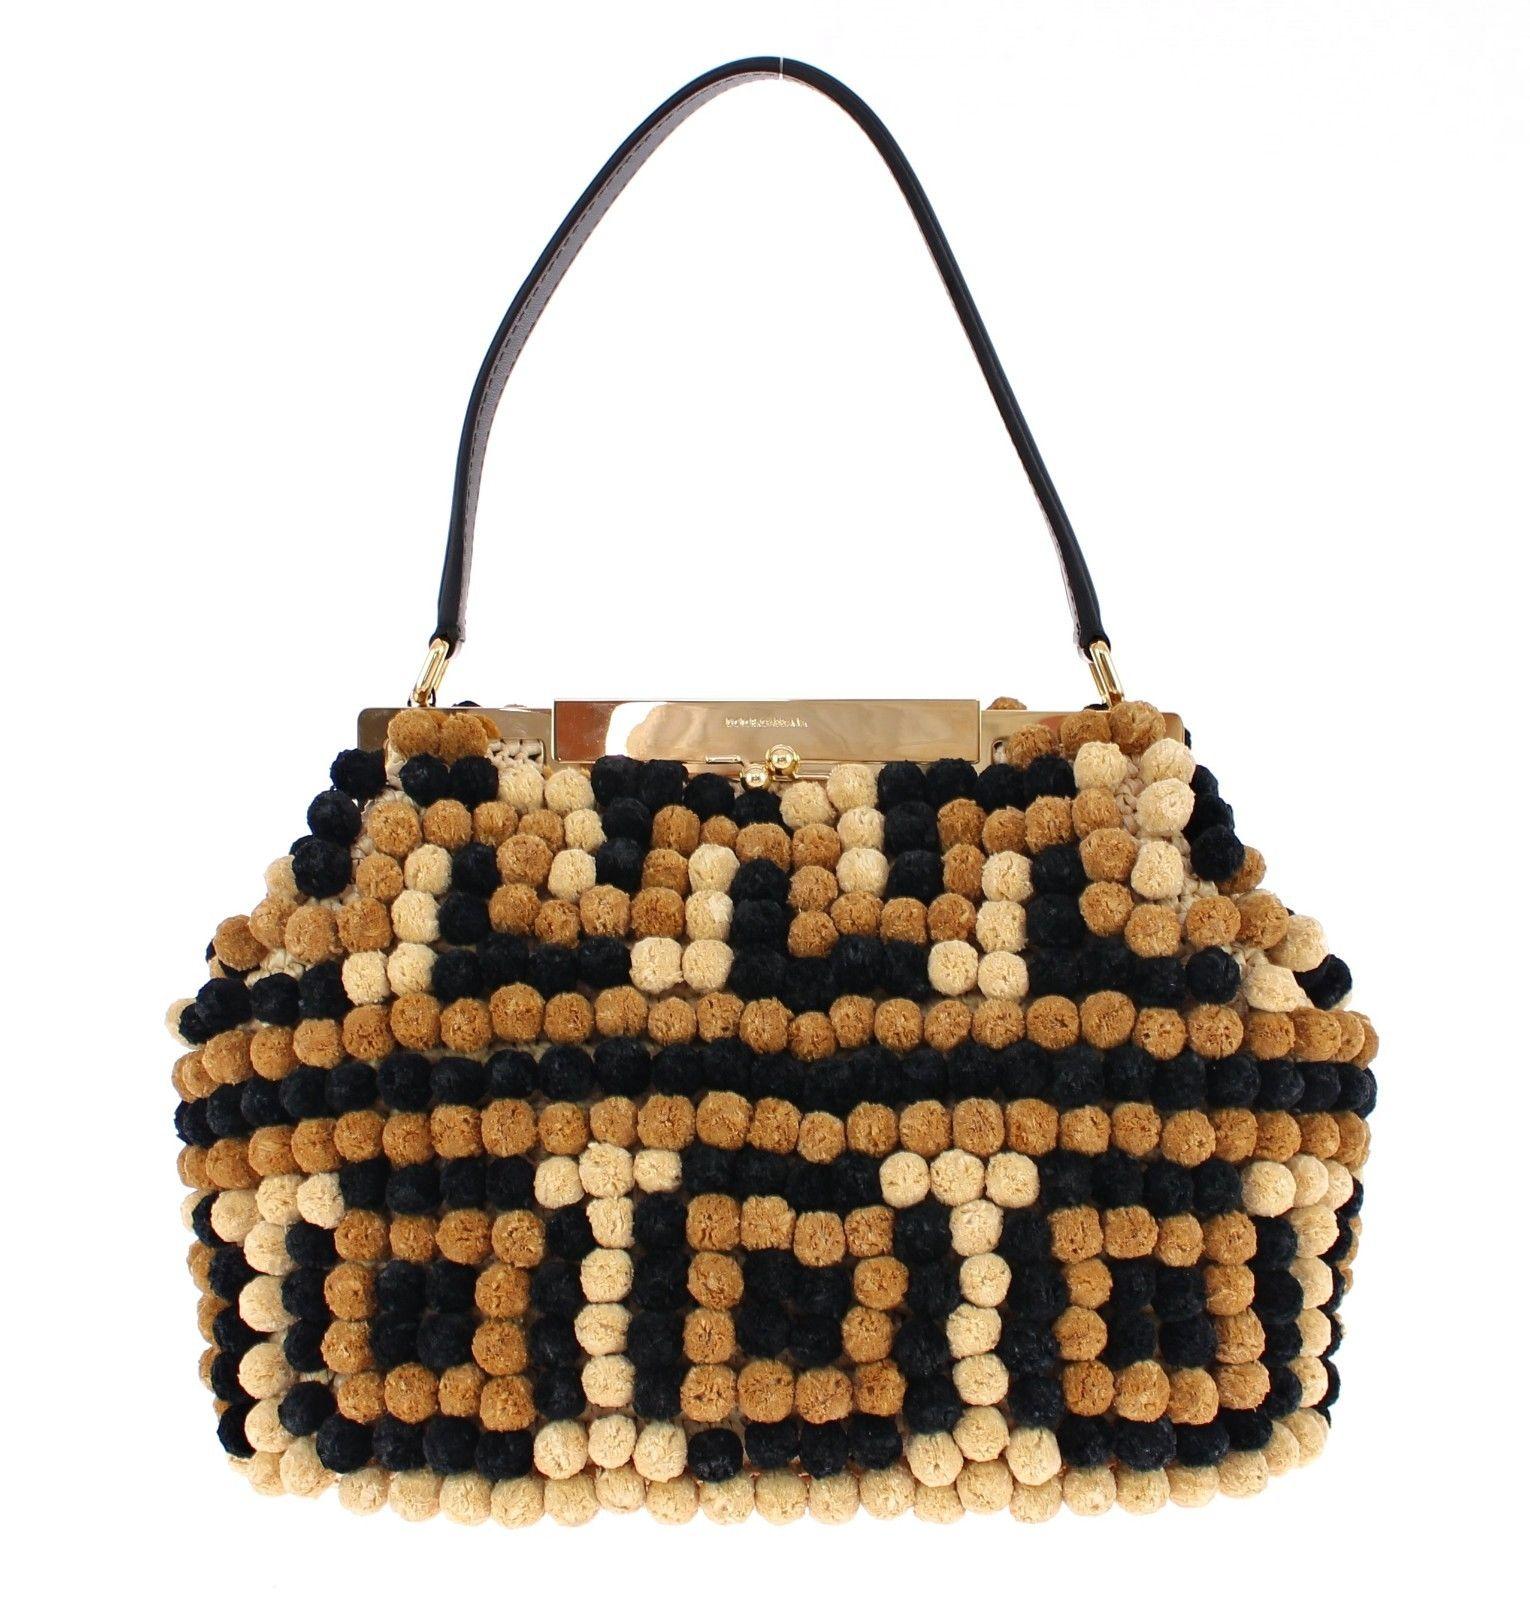 Dolce & Gabbana Women's Sara Raffia Leather Pebbled Shoulder Bag Black MOM24448